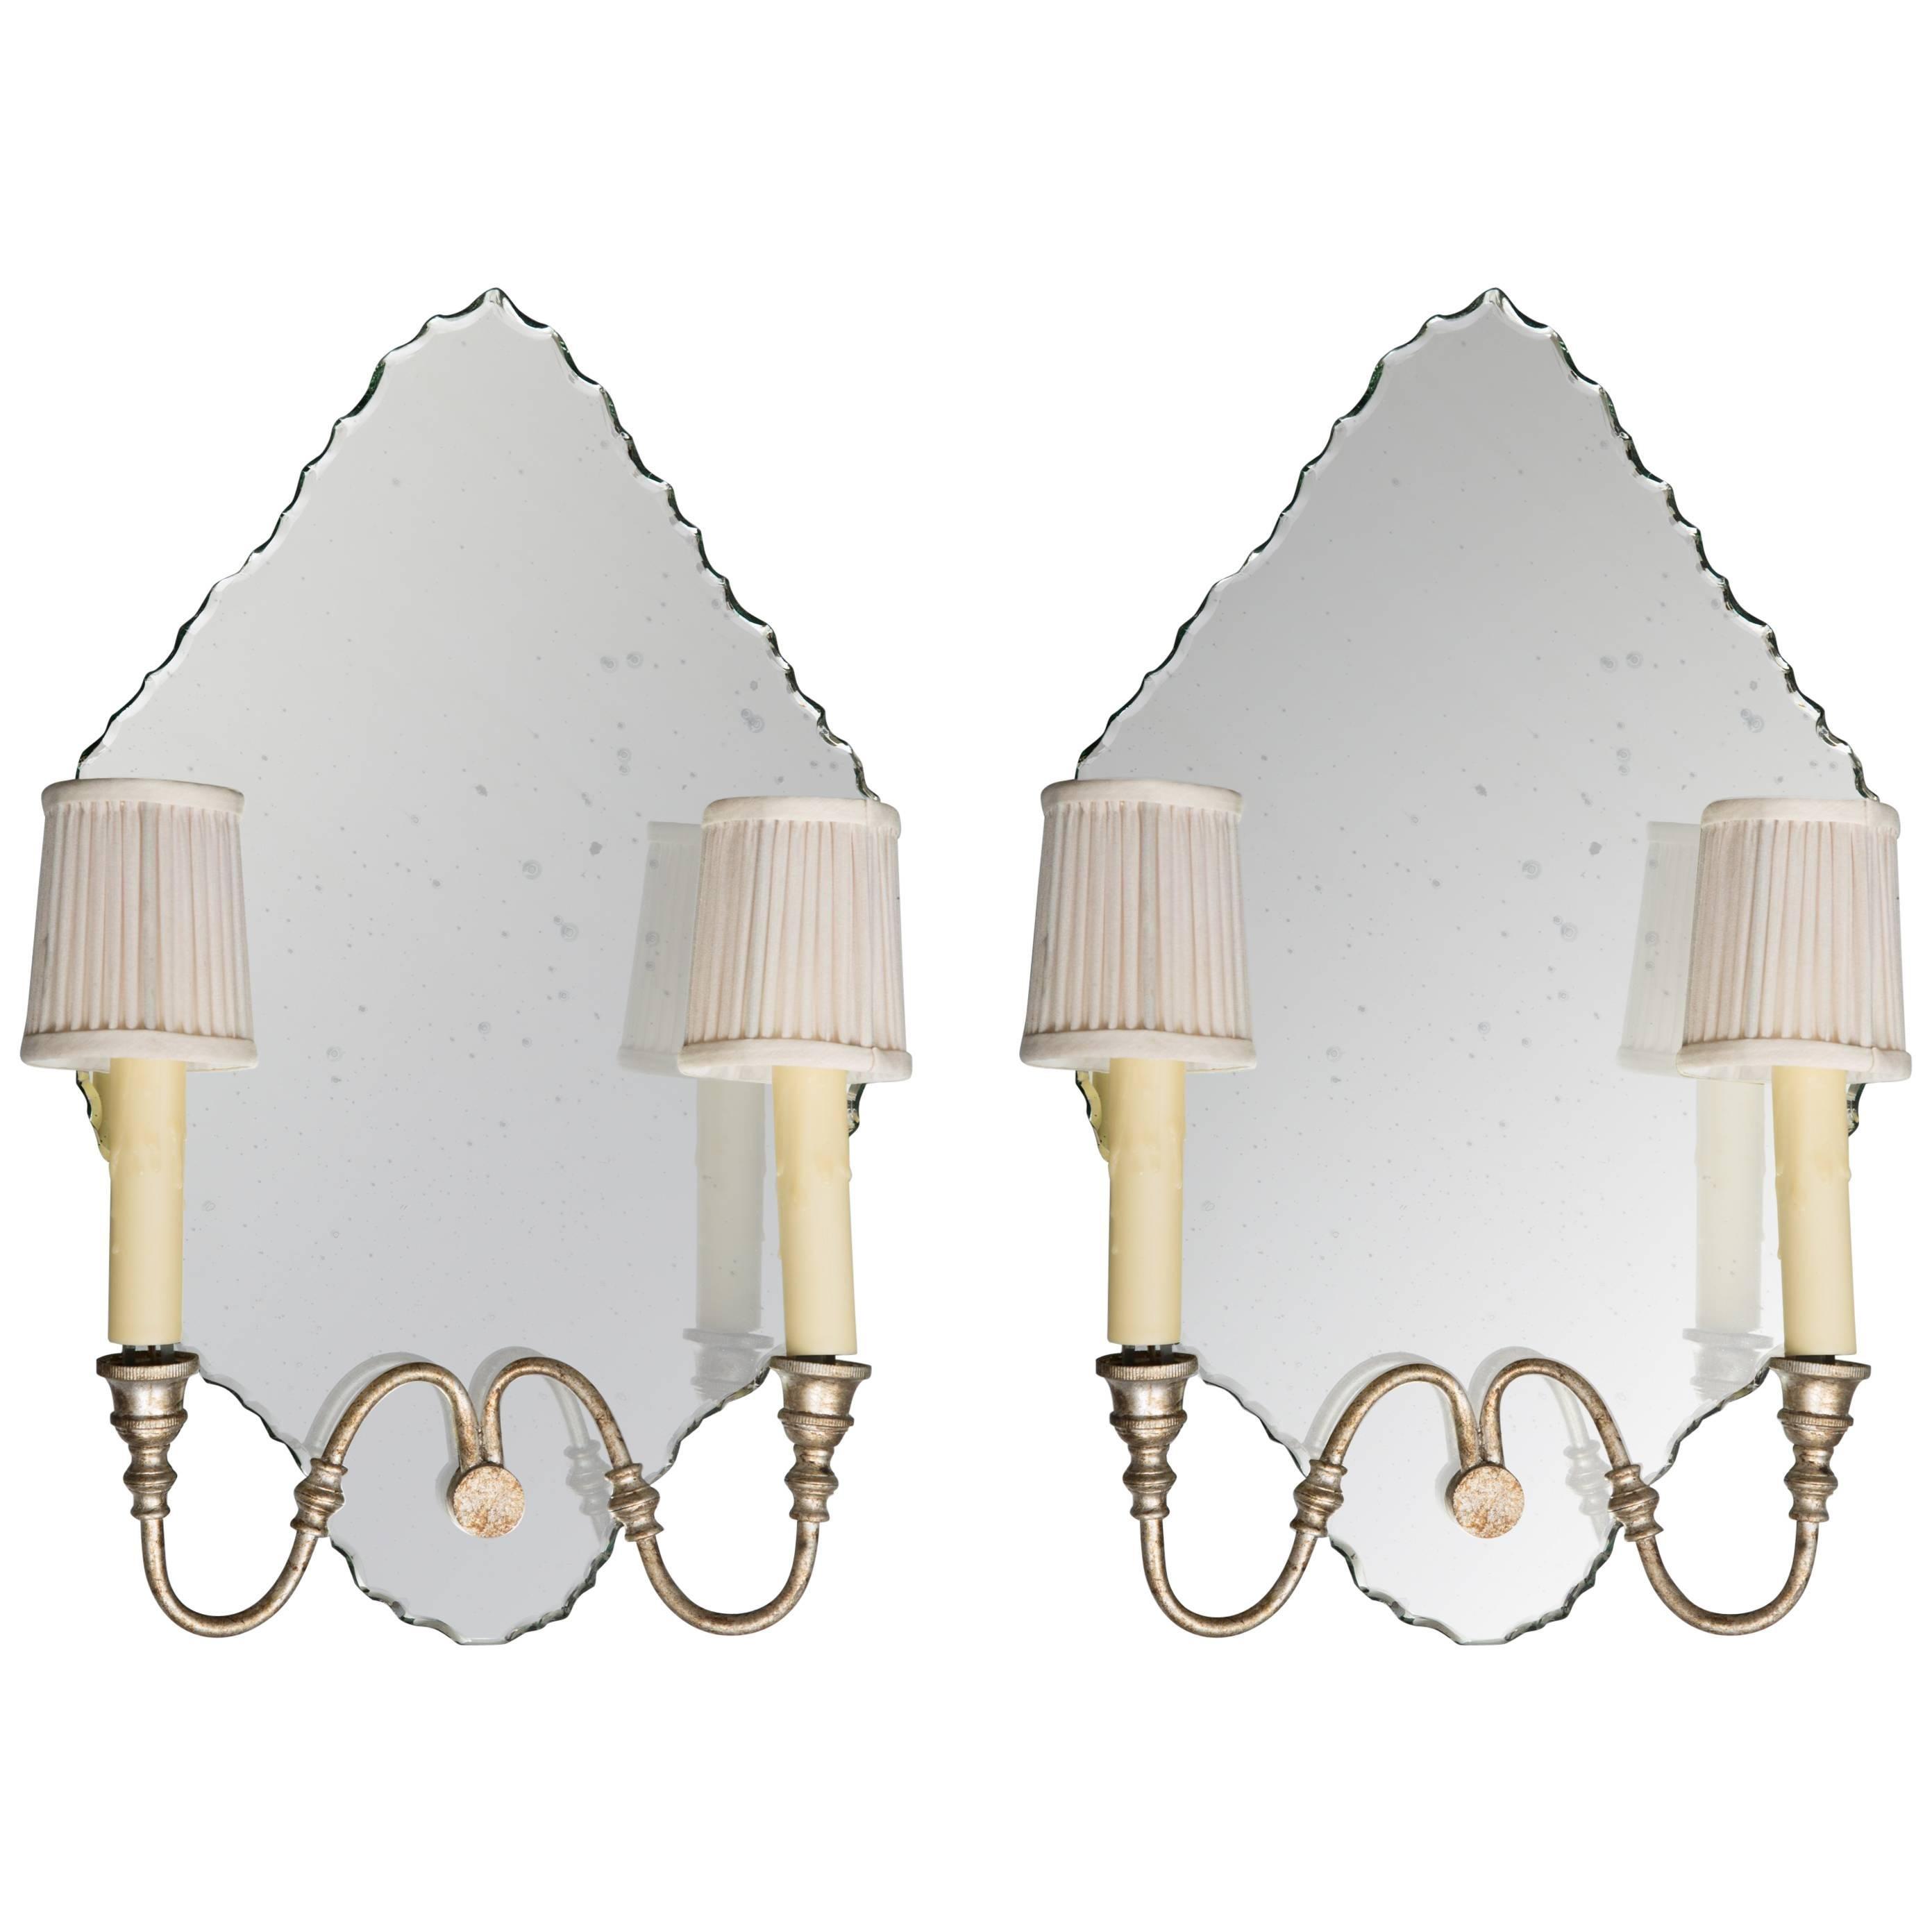 Pair of Italian Mirrored Sconces